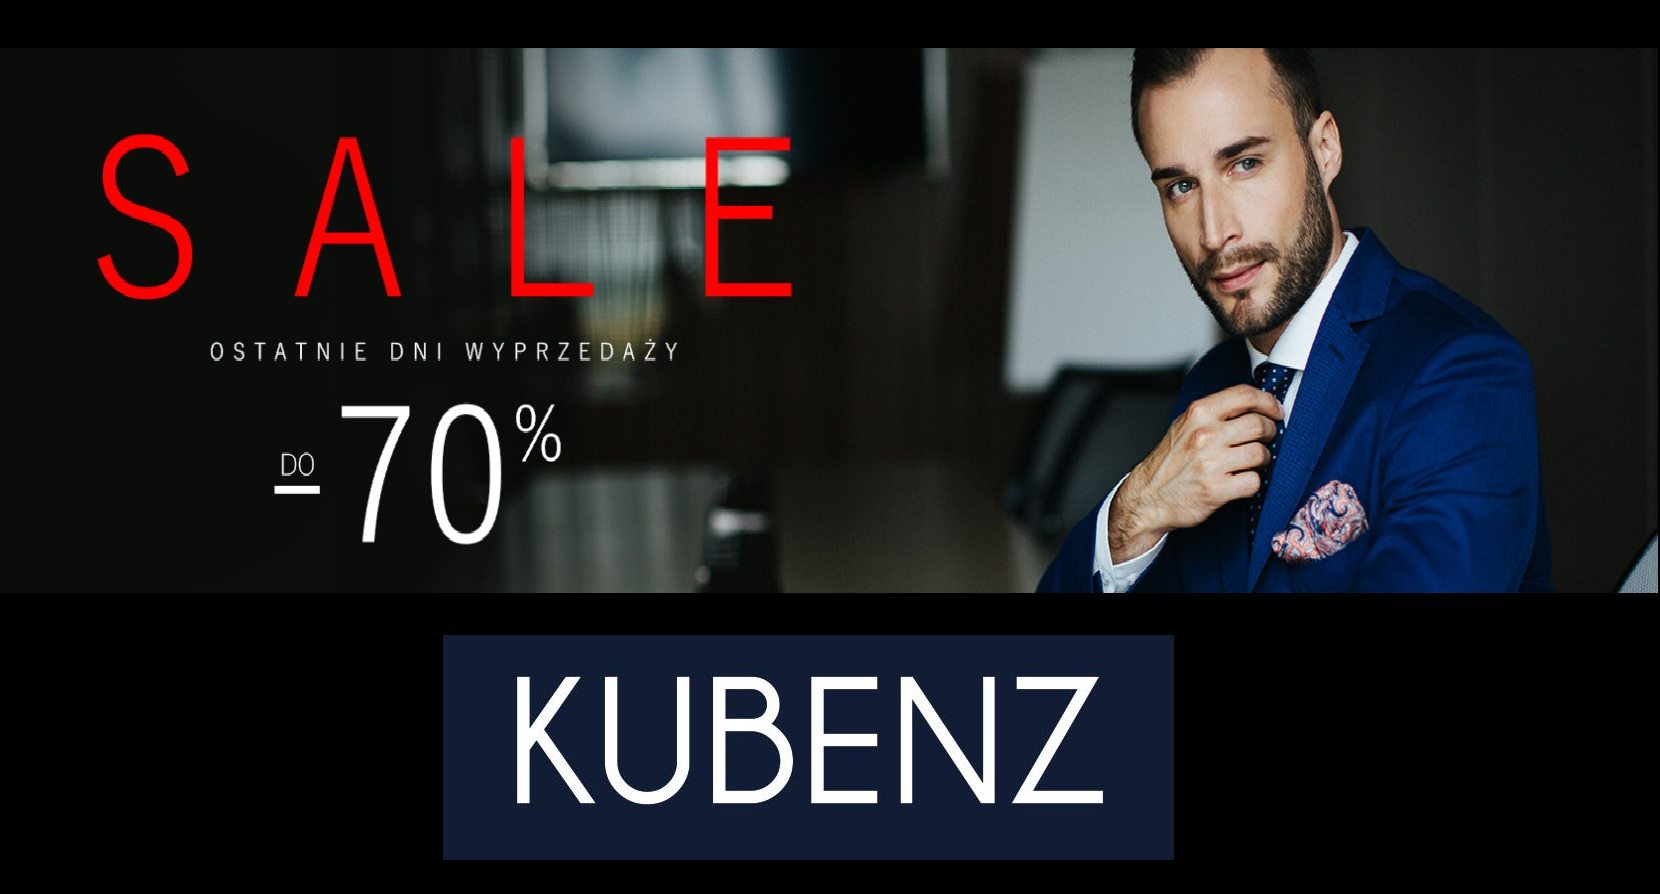 kubenz_6112017